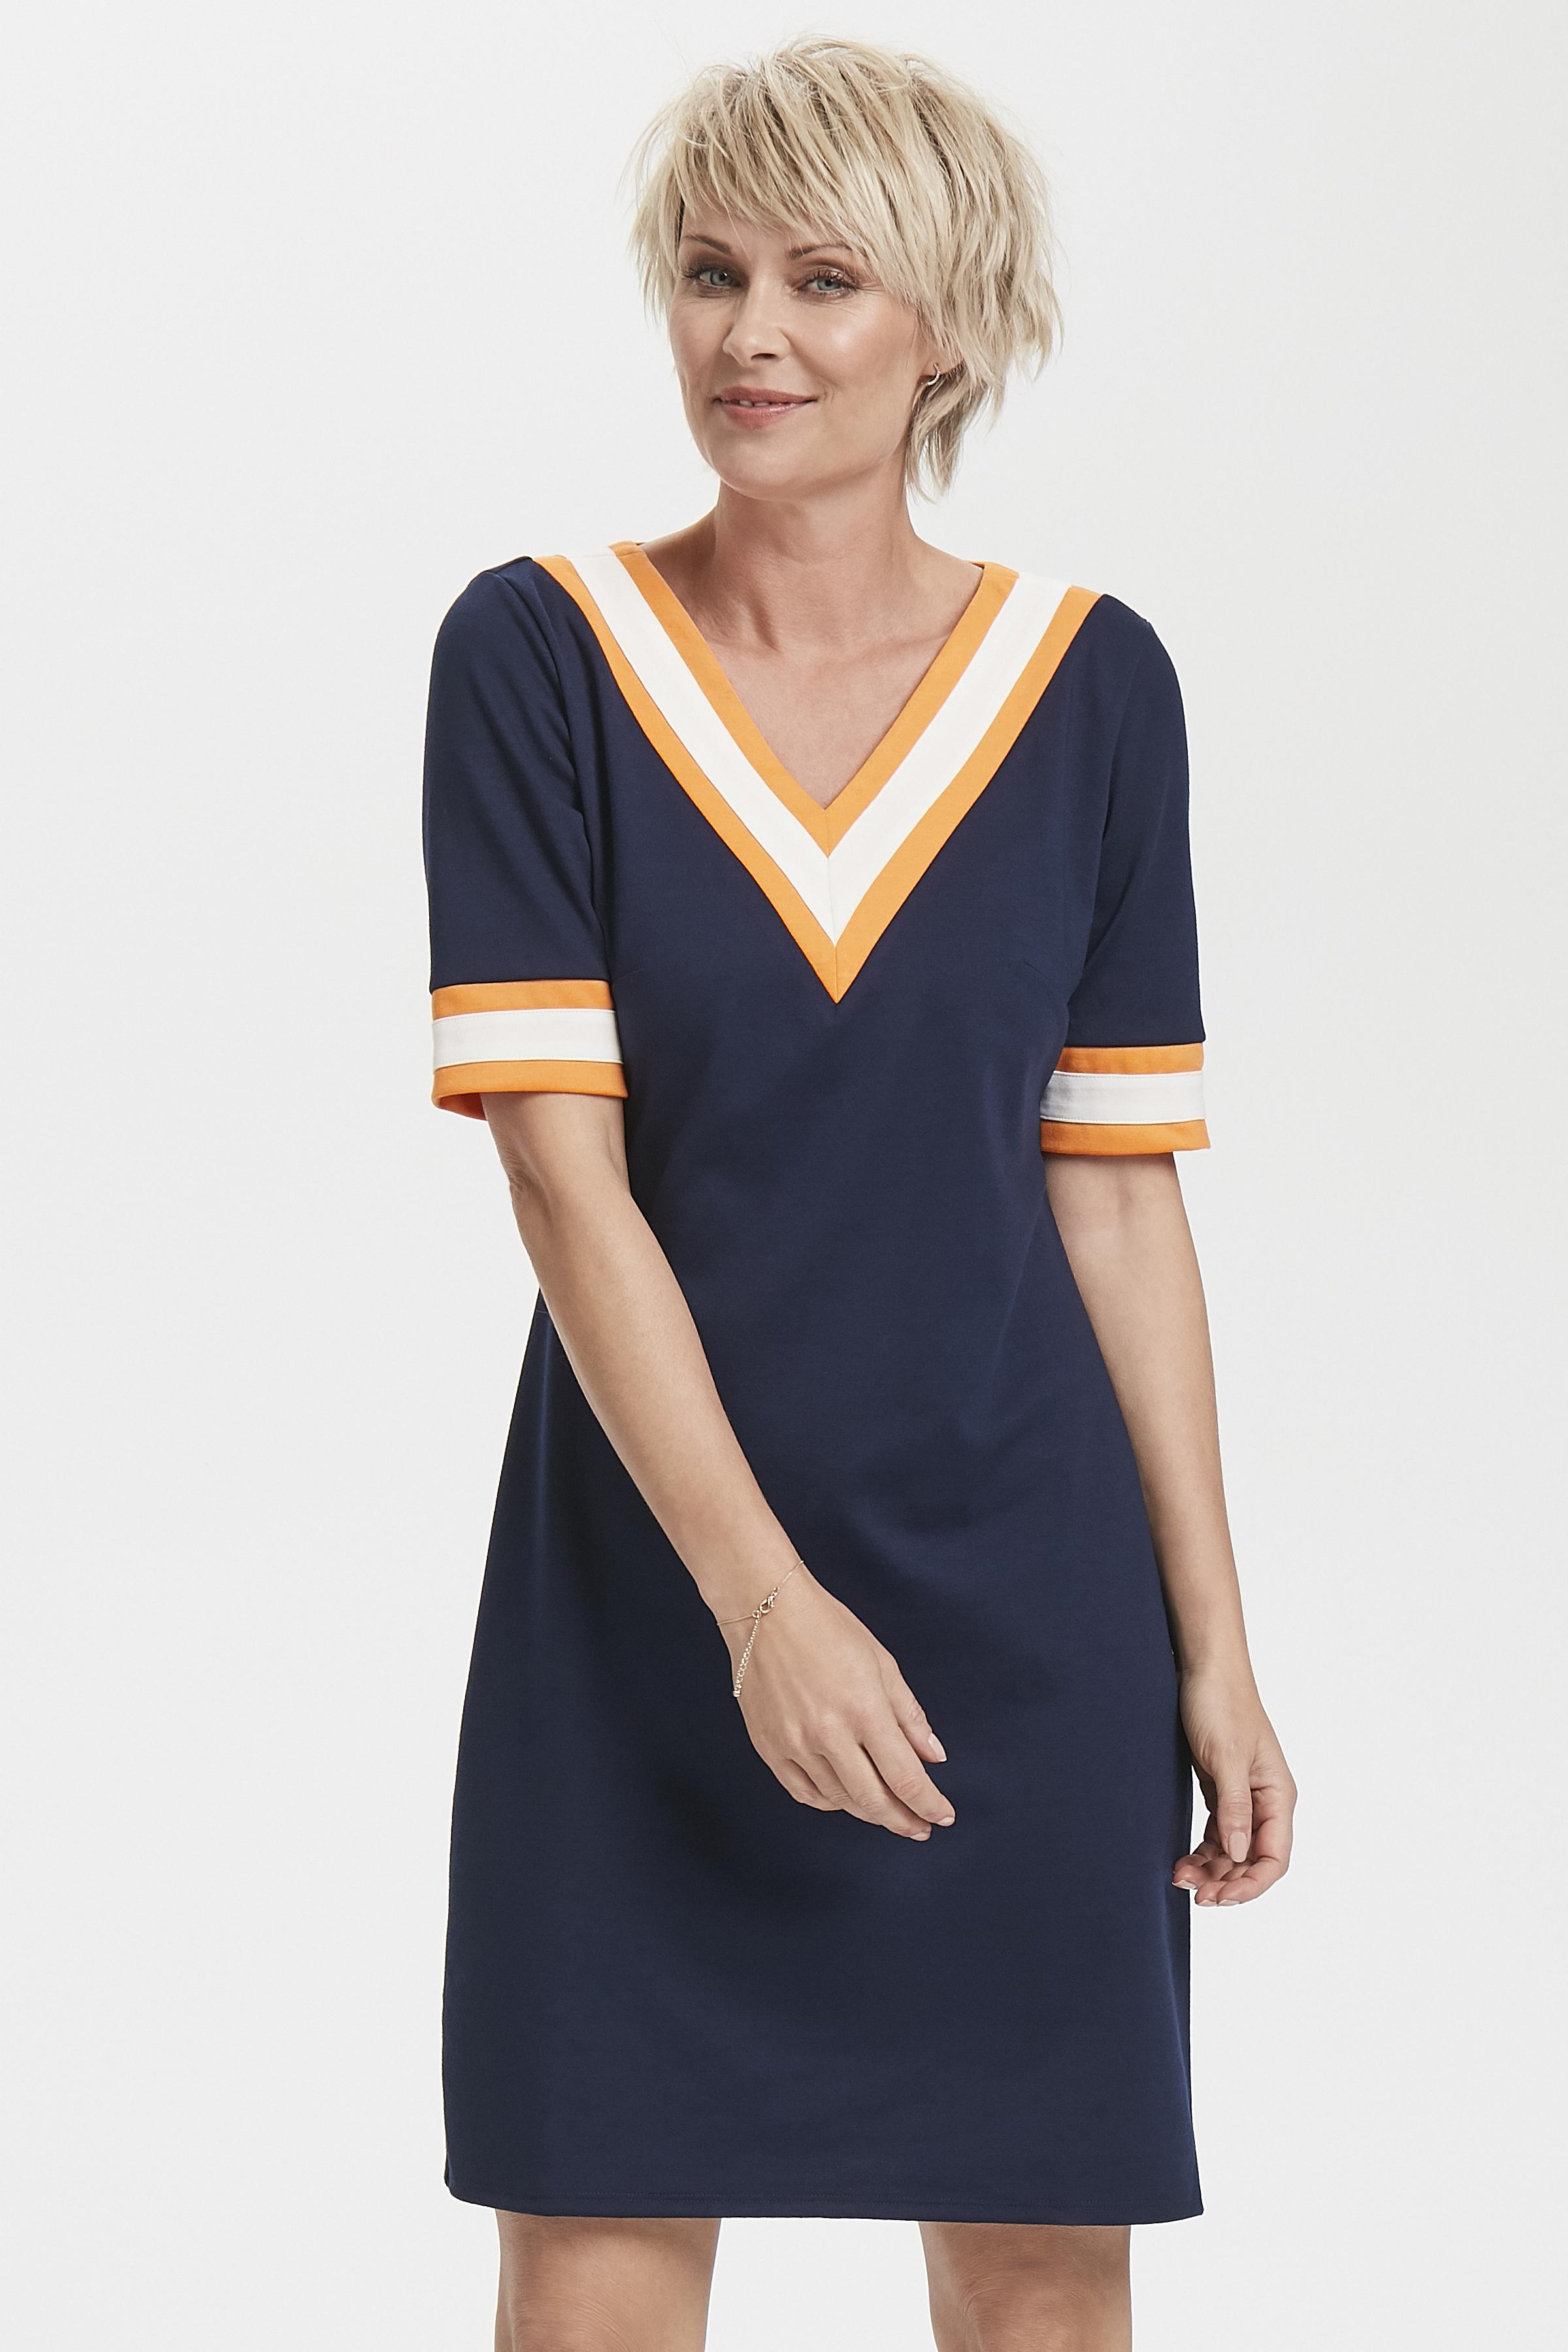 Marineblauw/oranje Jurk van Fransa – Door Marineblauw/oranje Jurk van maat. XS-XXL hier